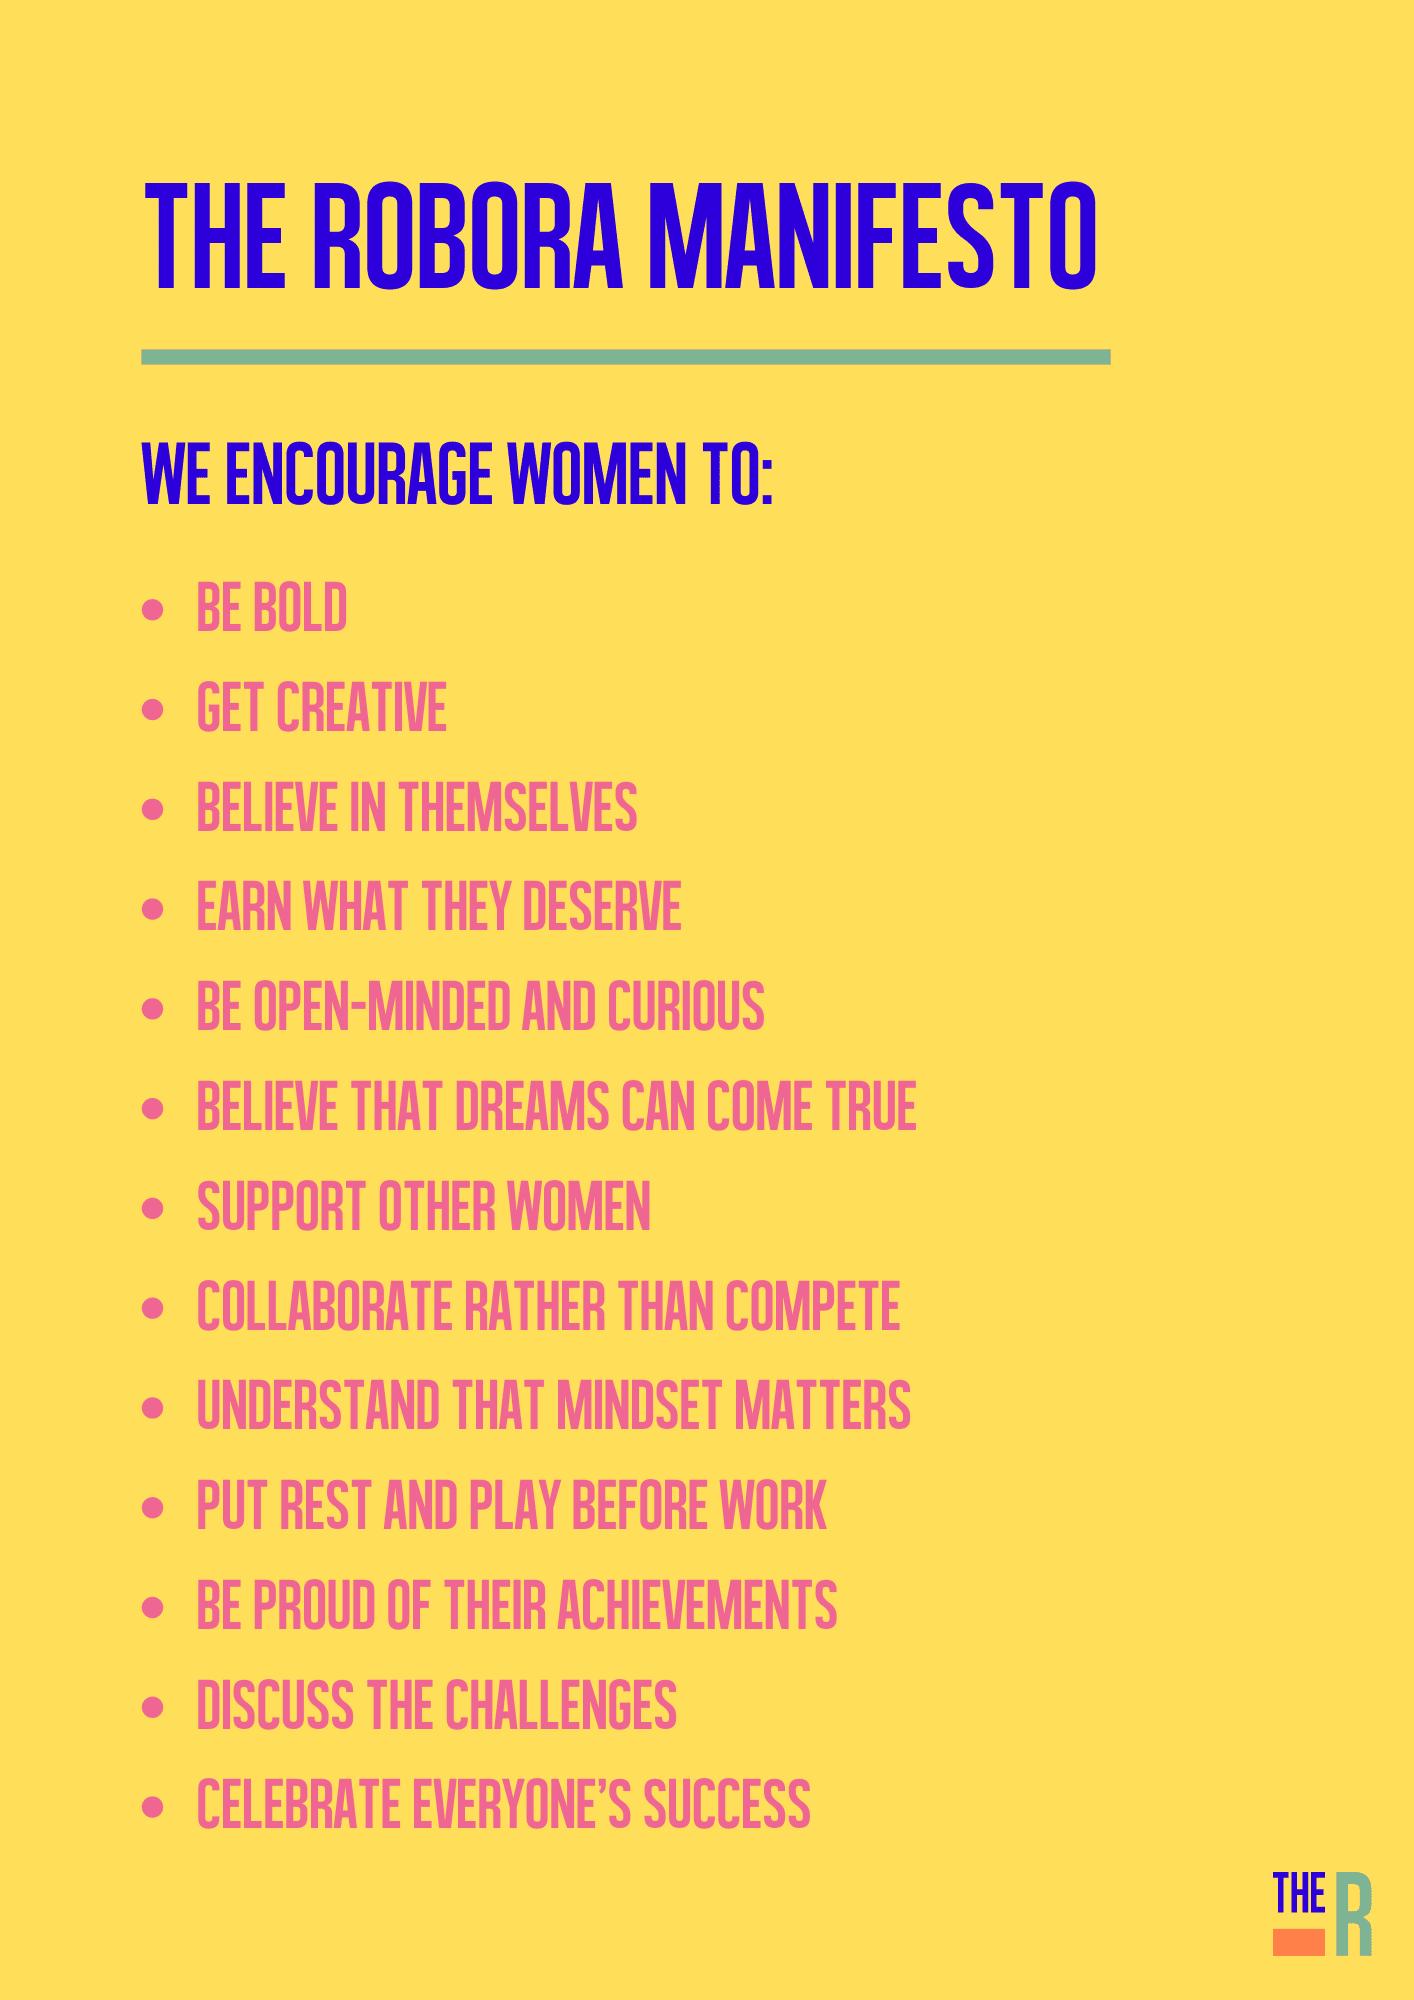 The Robora manifesto